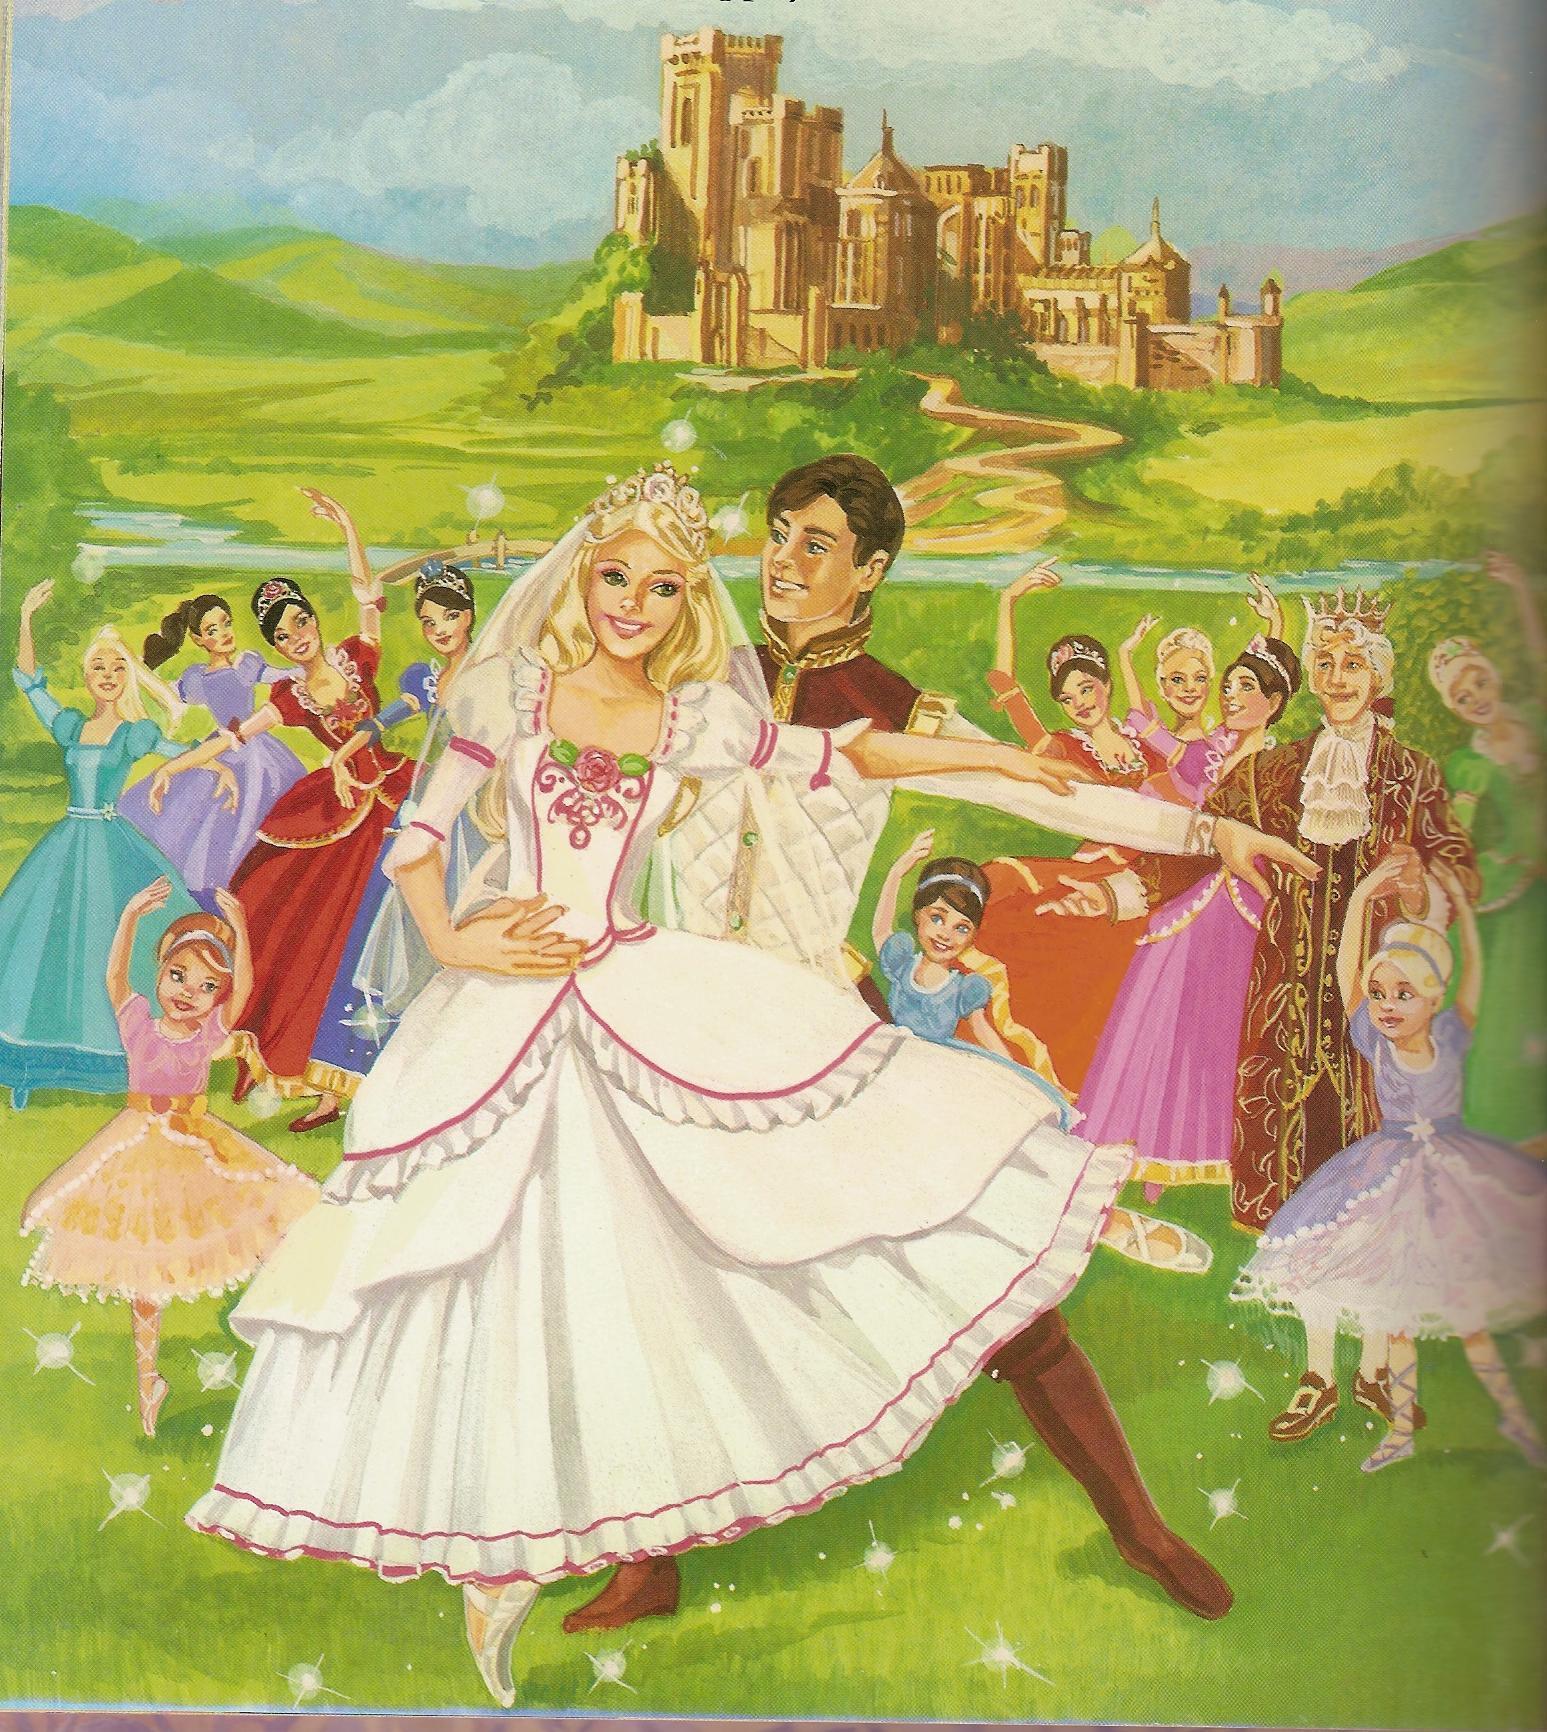 Barbie 12 dancing princesses on pinterest barbie - Barbie 12 princesse ...